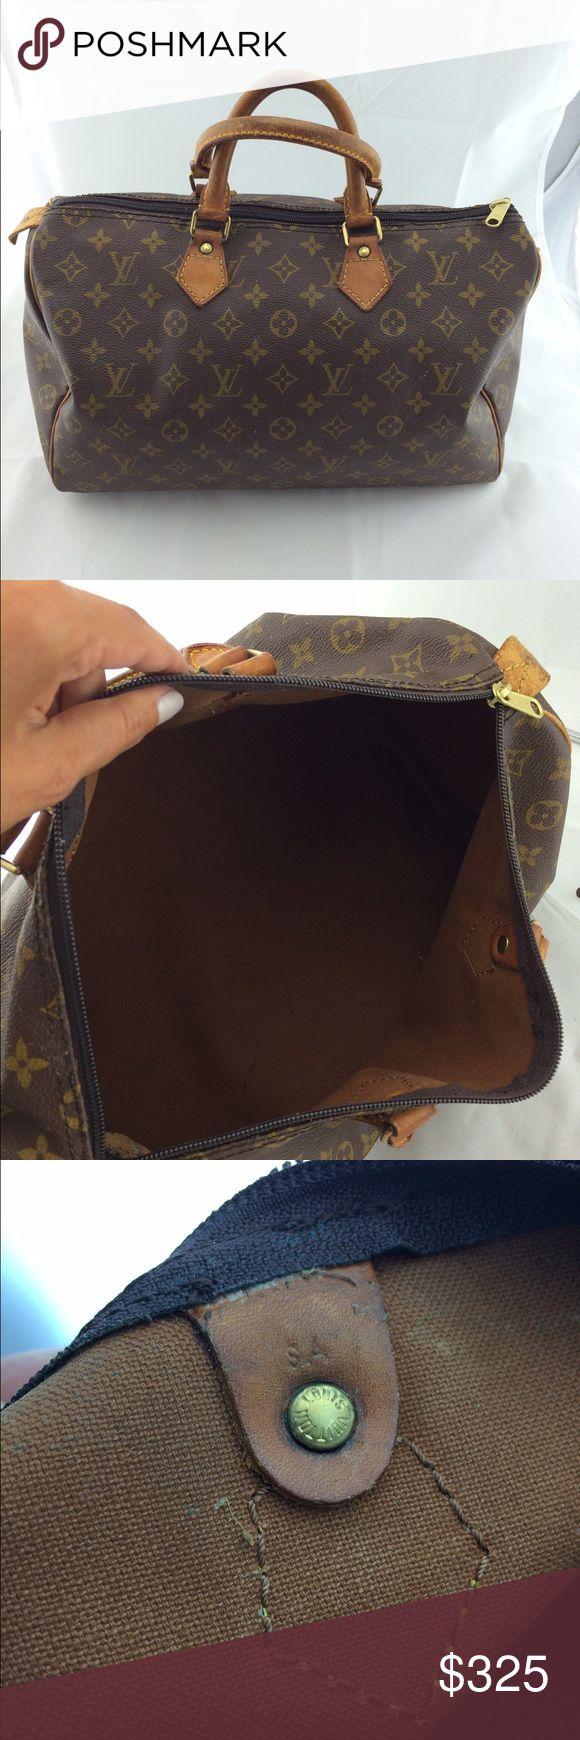 Authentic Louis Vuitton speedy 35 Vintage.just replaced zipper .100% authentic.no trades Louis Vuitton Bags Totes